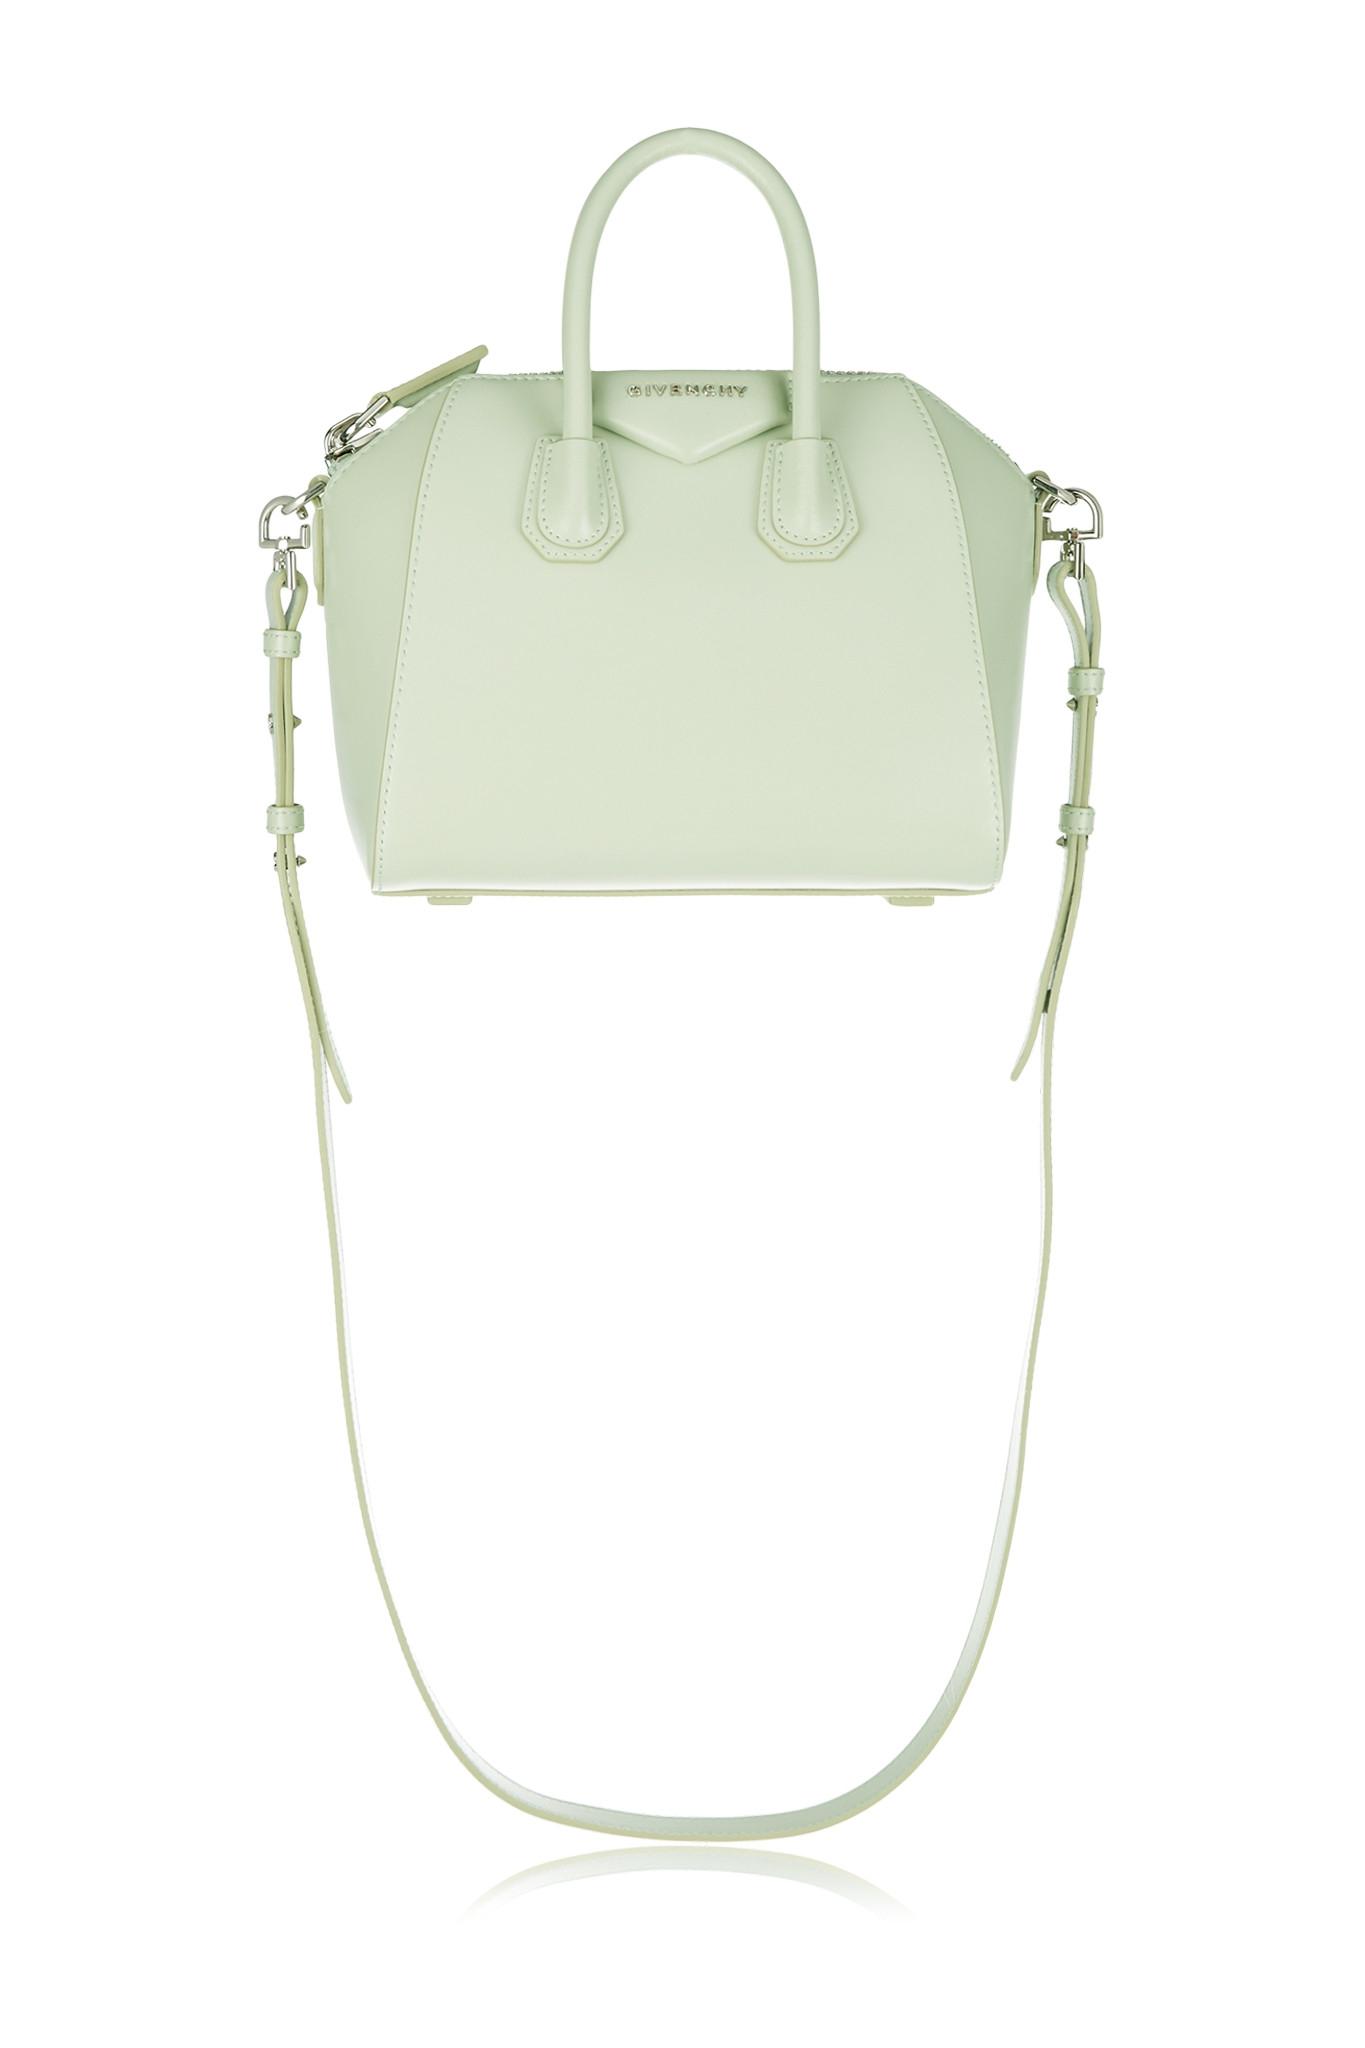 e73888b9c1e6 Lyst - Givenchy Mini Antigona Shoulder Bag In Mint Leather in Green